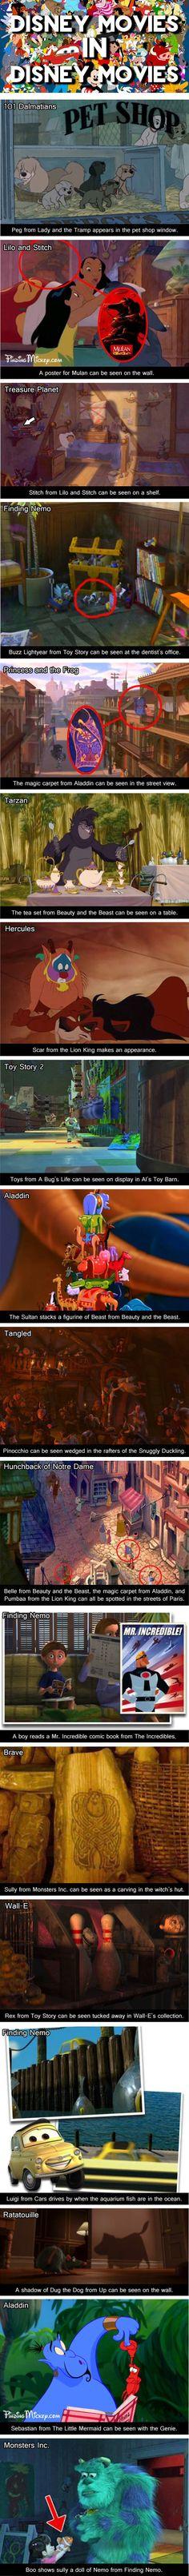 Disney Movies in Disney Movies.